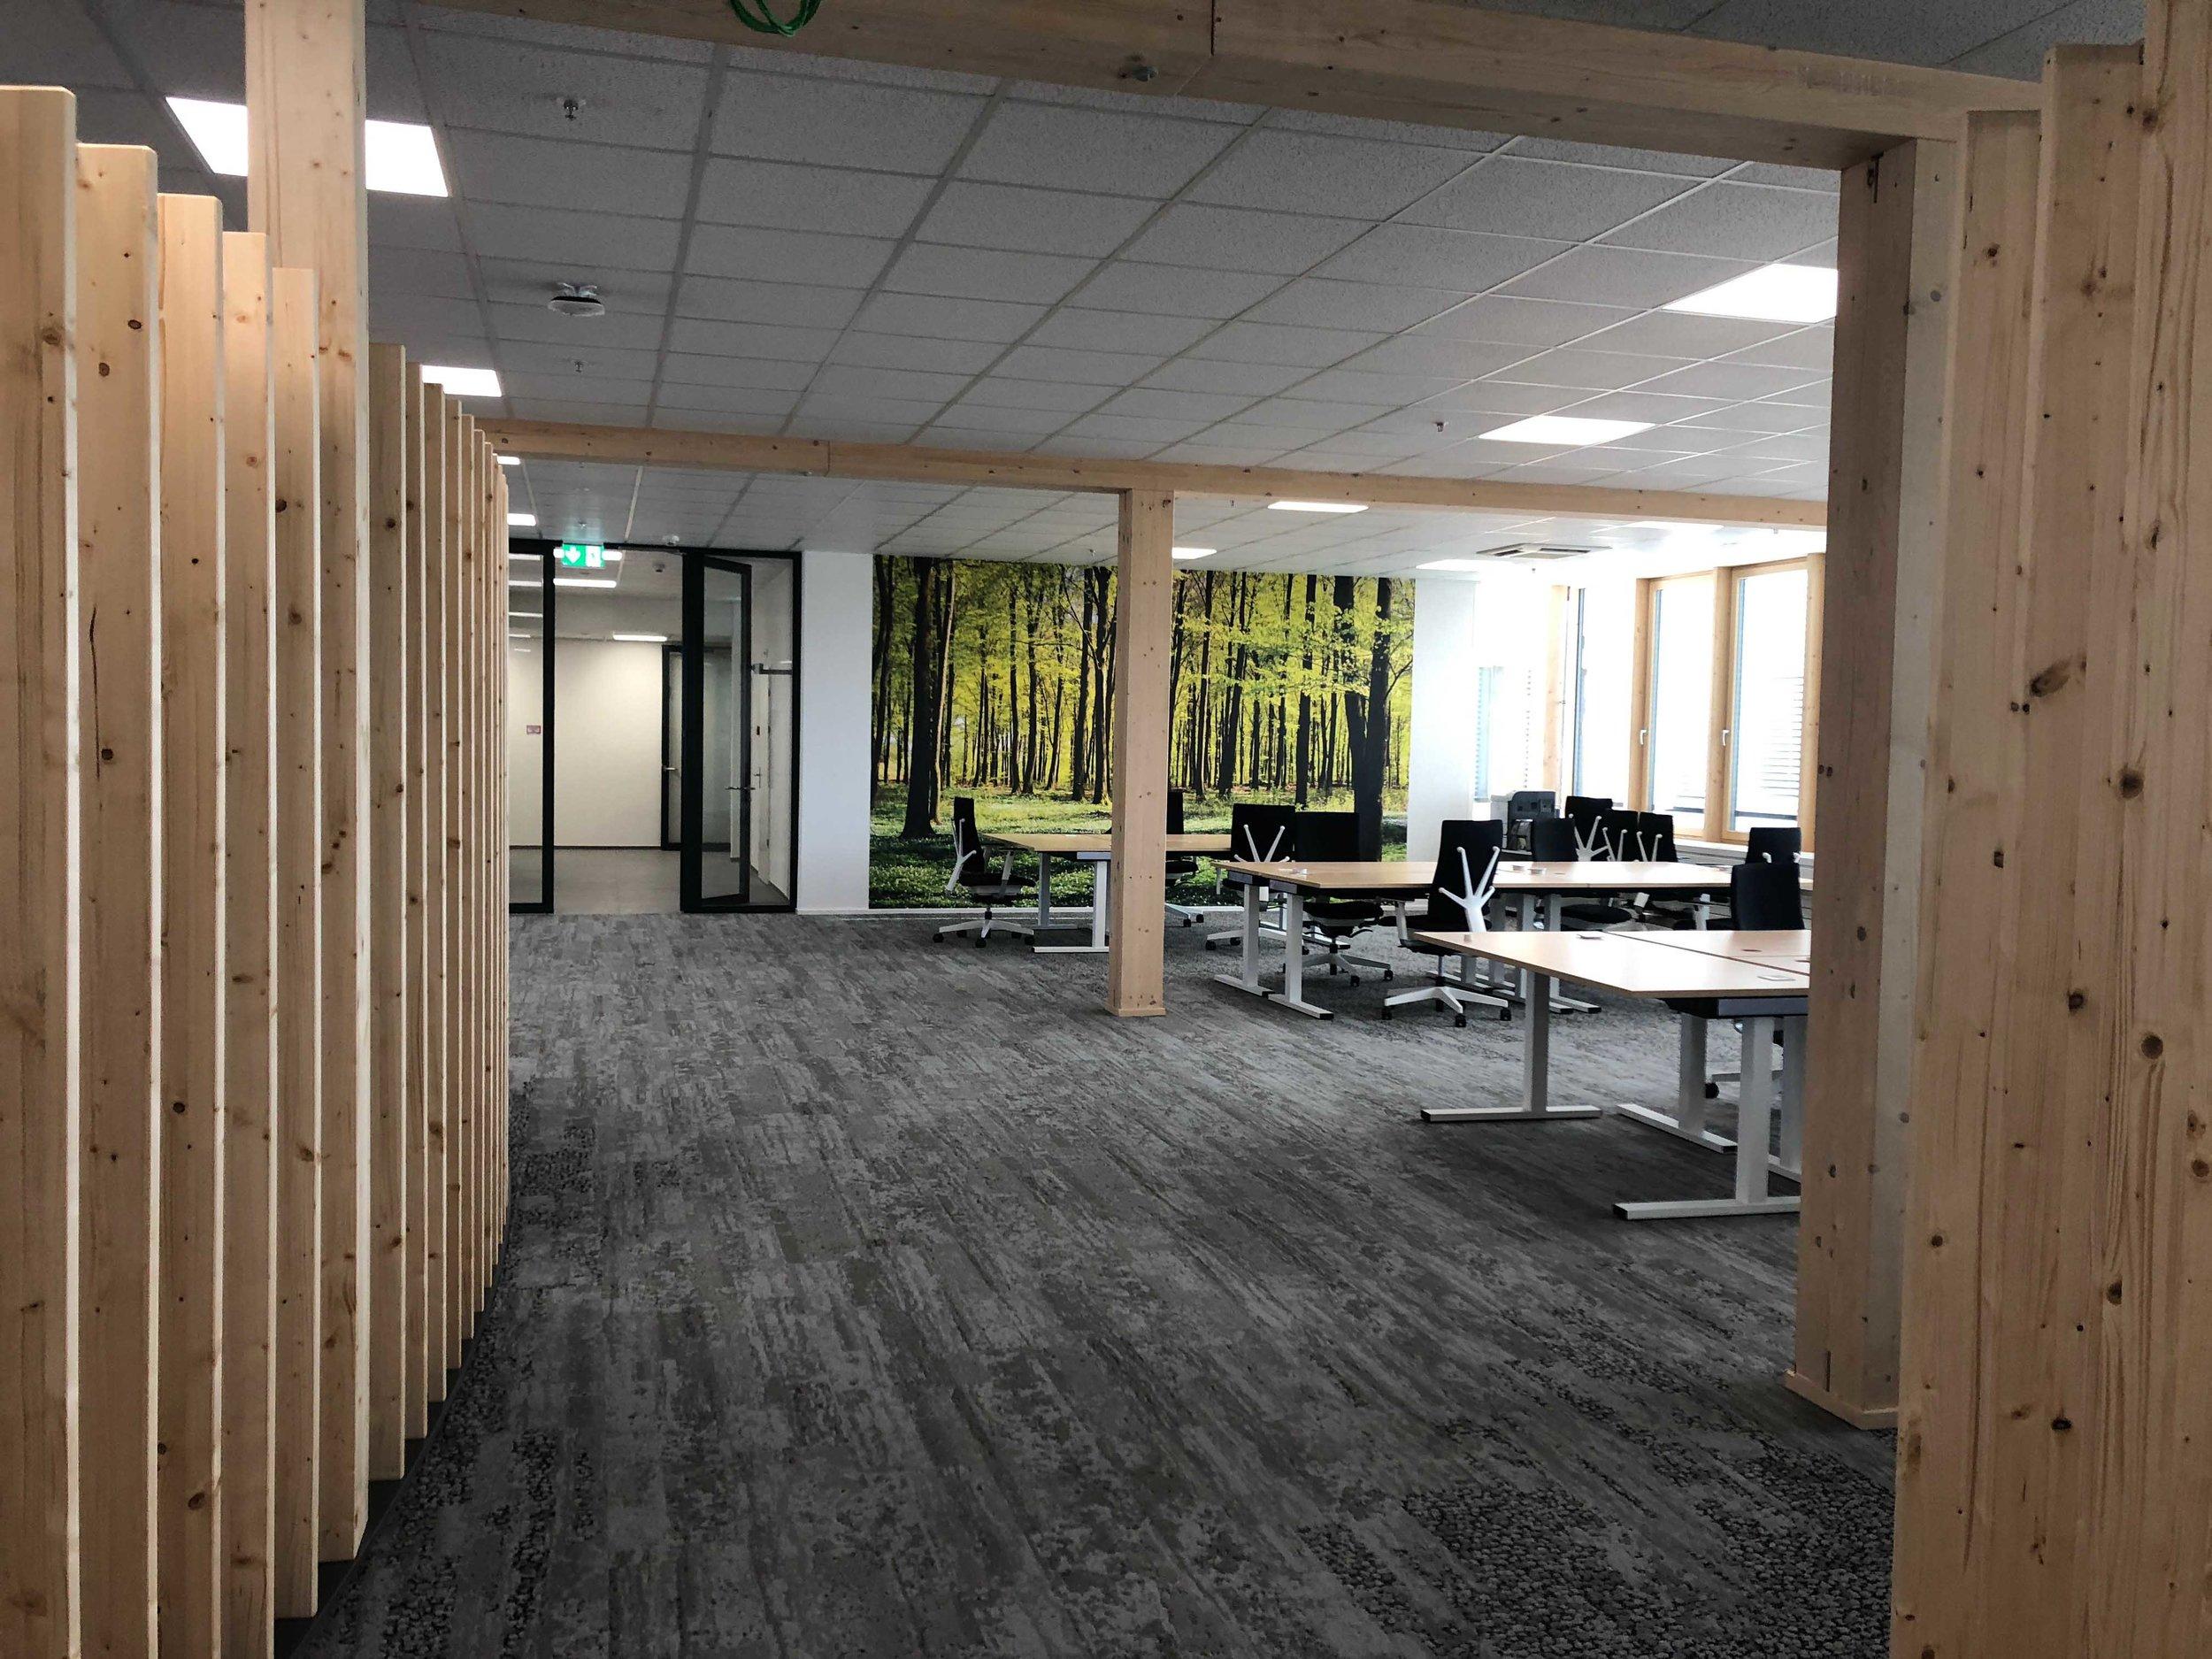 Competec_Brack_Office_Pengland 2018 (7).jpg